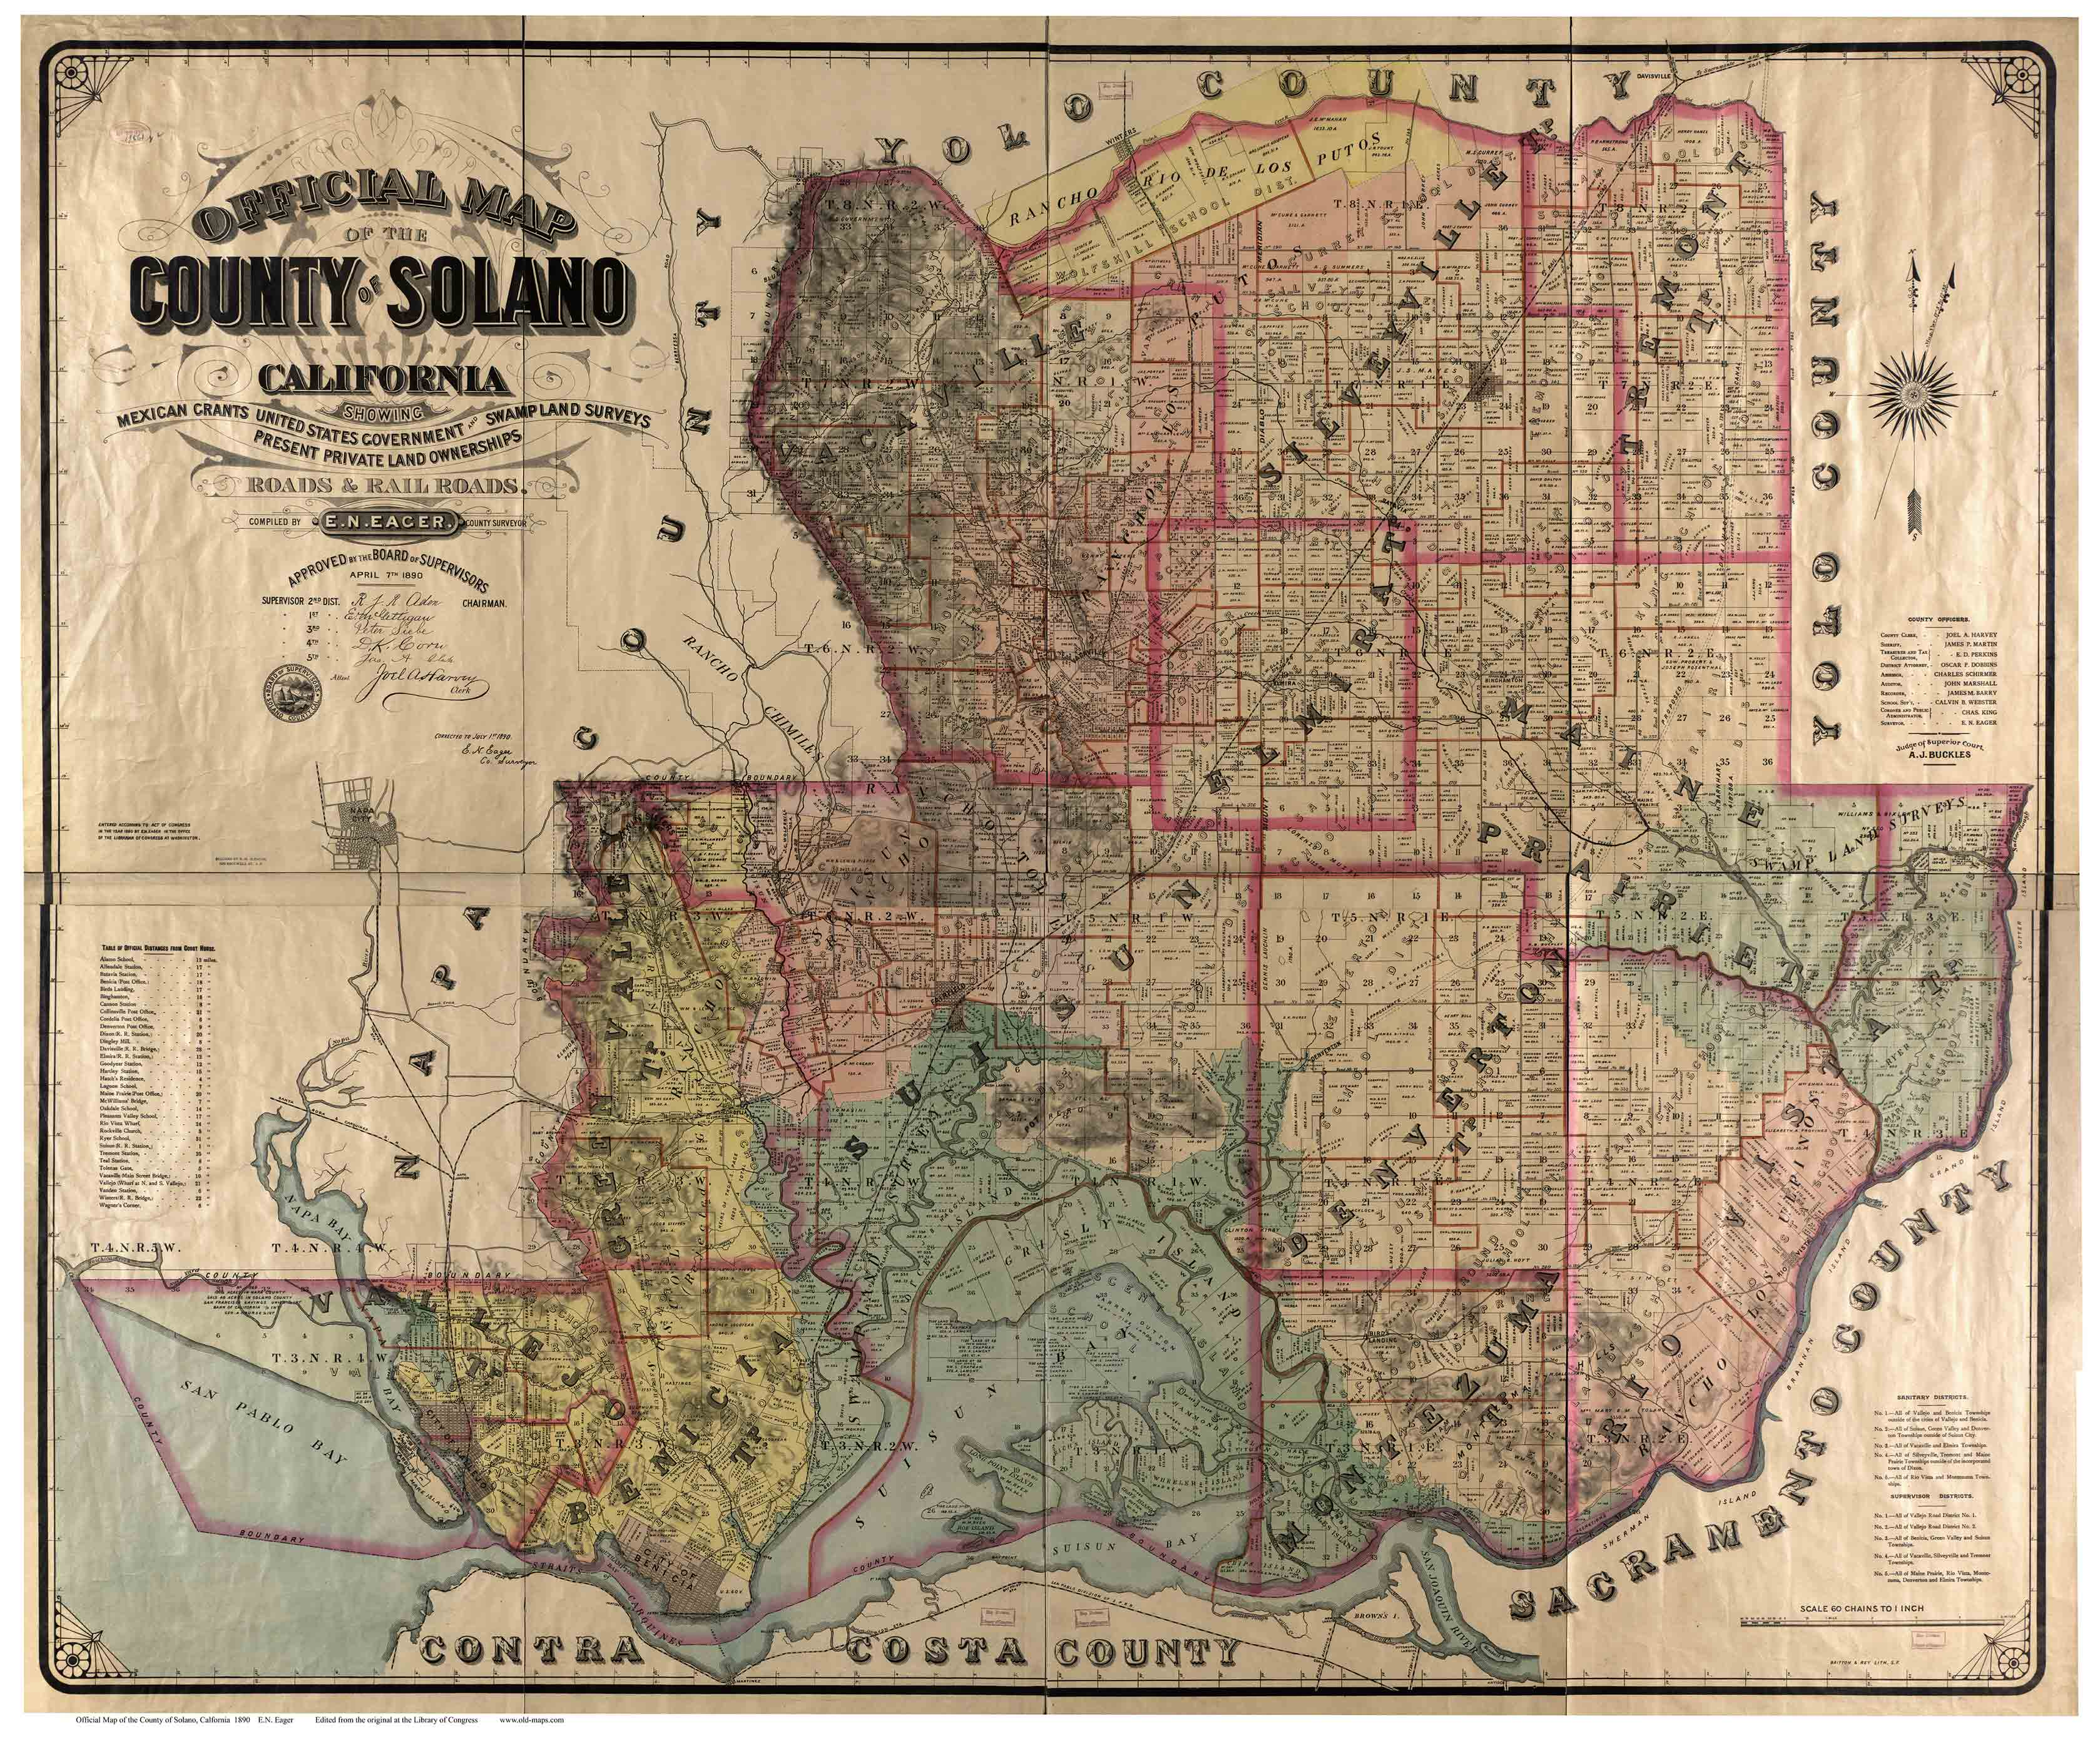 Solano County California USGS Topographic Maps on CD